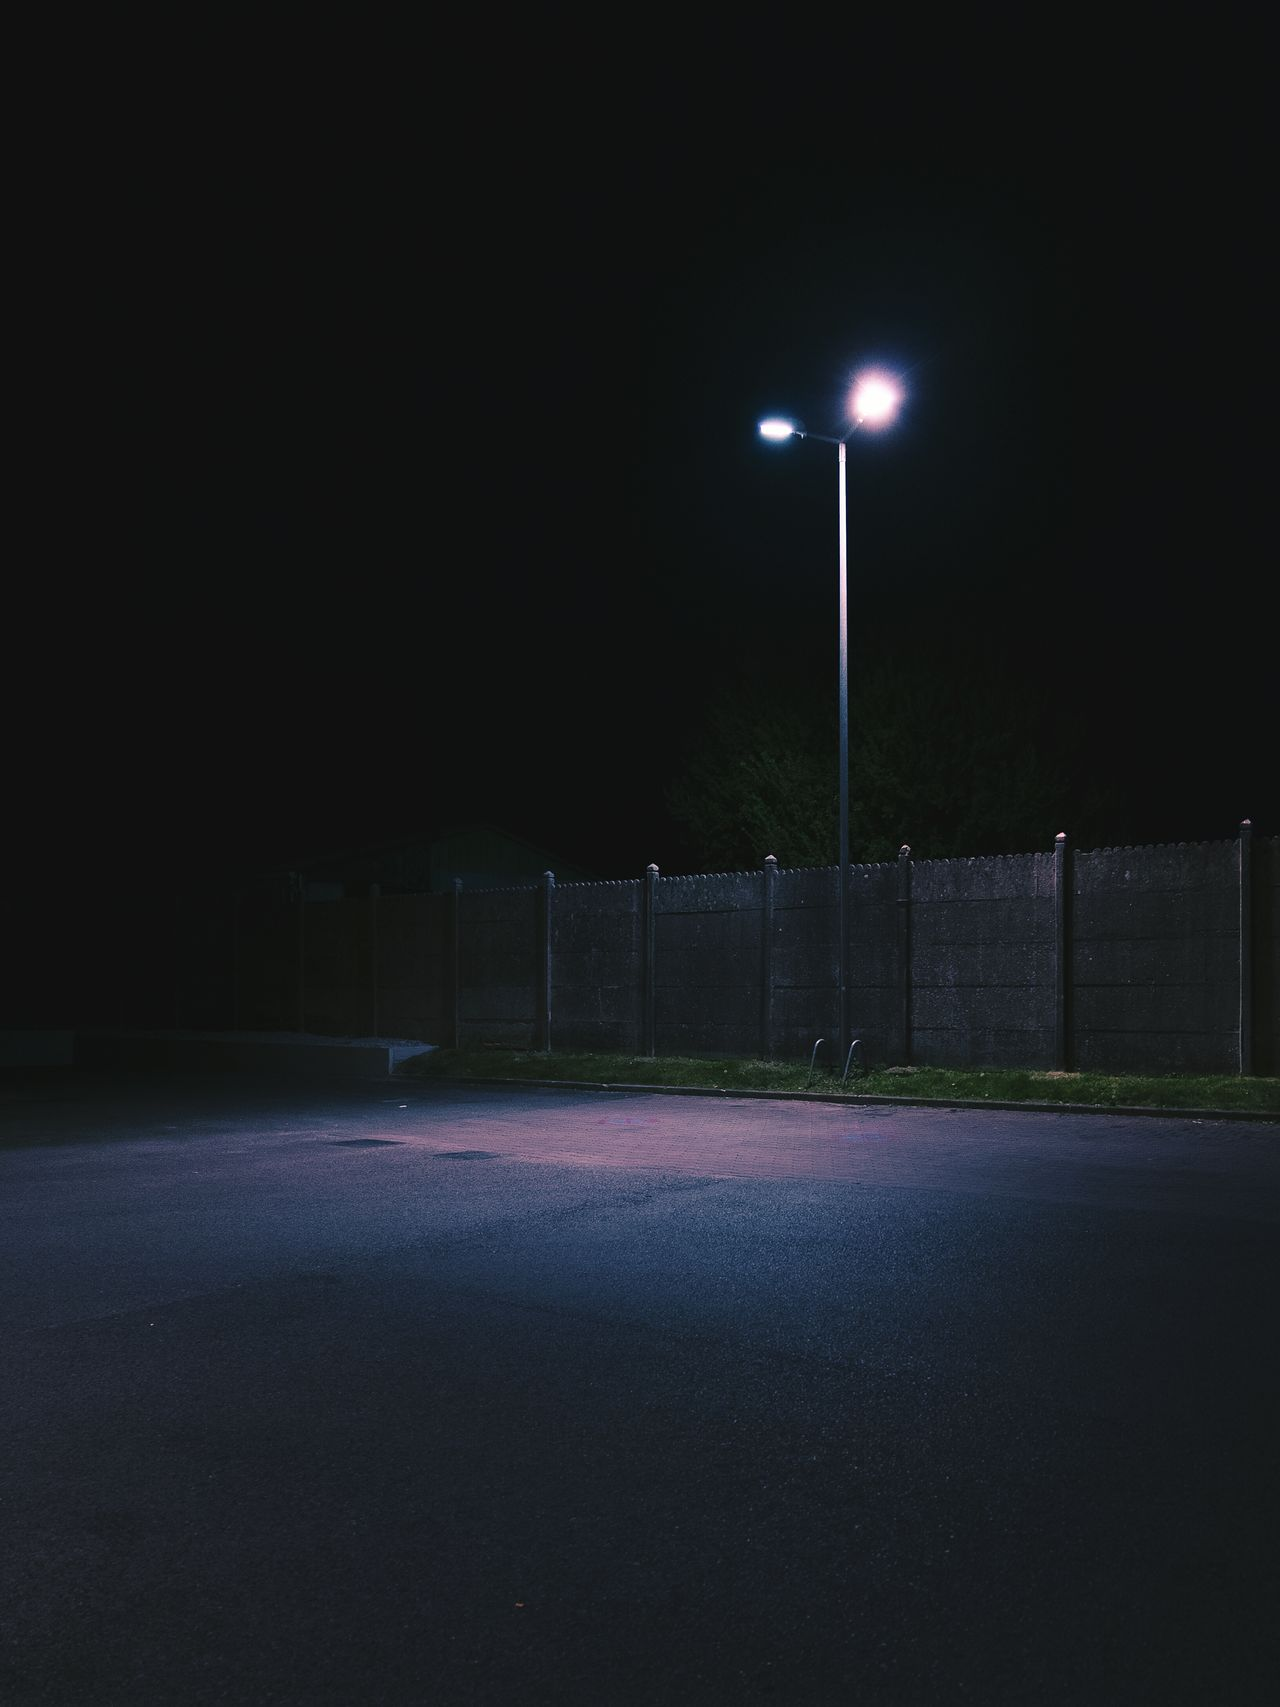 Lumiere nocturne - Saint-Saulve night illuminated Street Light no people sky spotlight nightsky Nightphotography vscocamedit VSCO vscocam photooftheday picoftheday purple longexposure urban Fresh on Market 2017